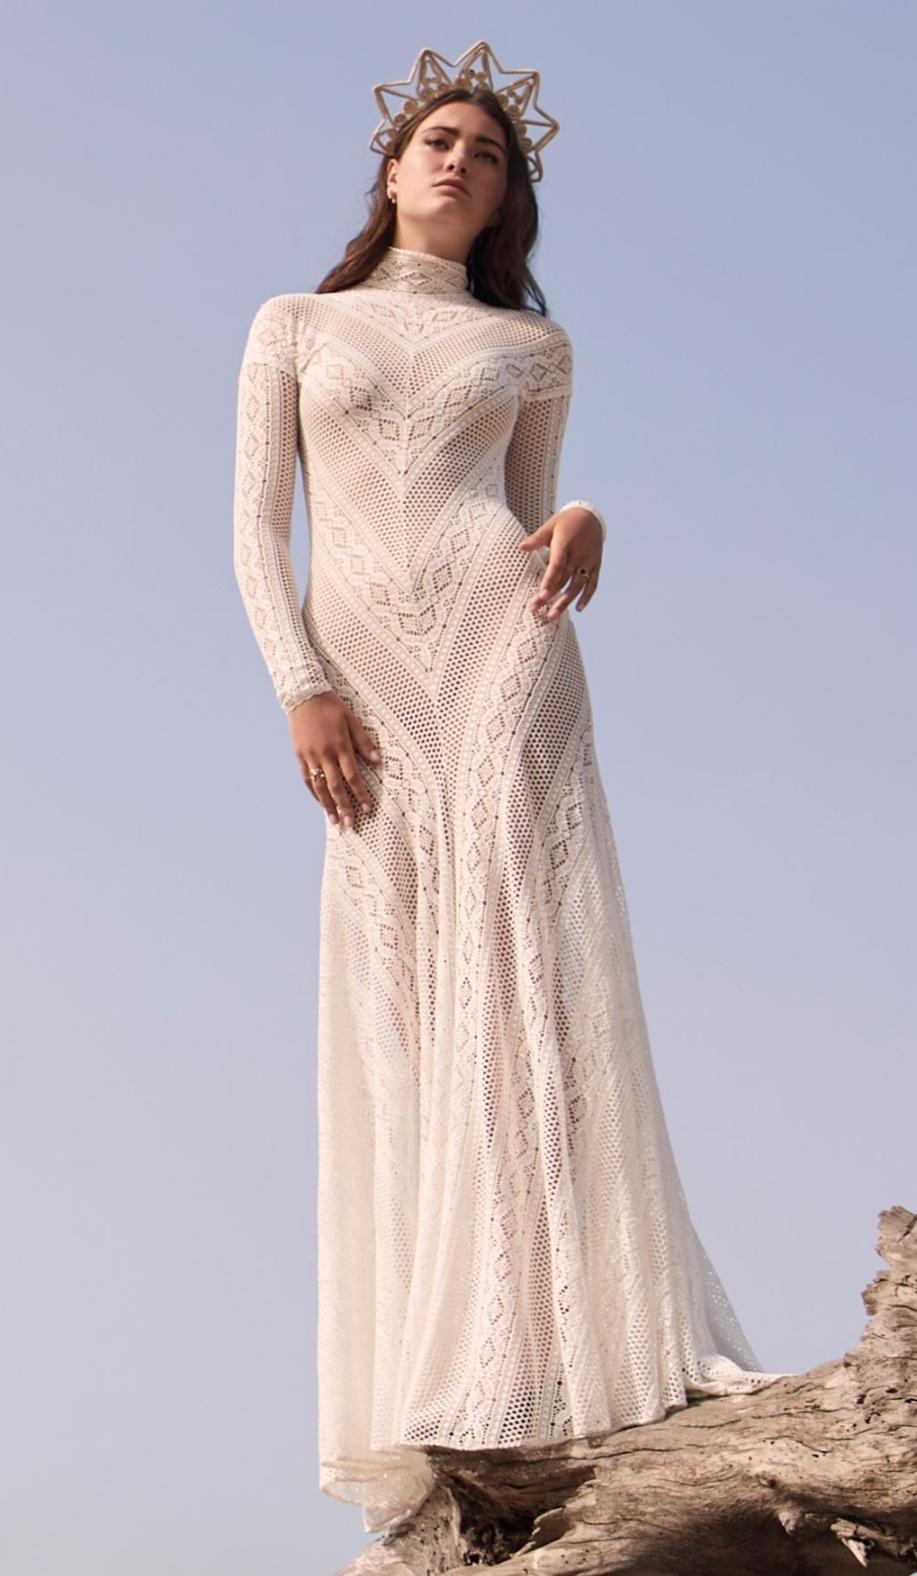 Crochet high neck Boho wedding dress